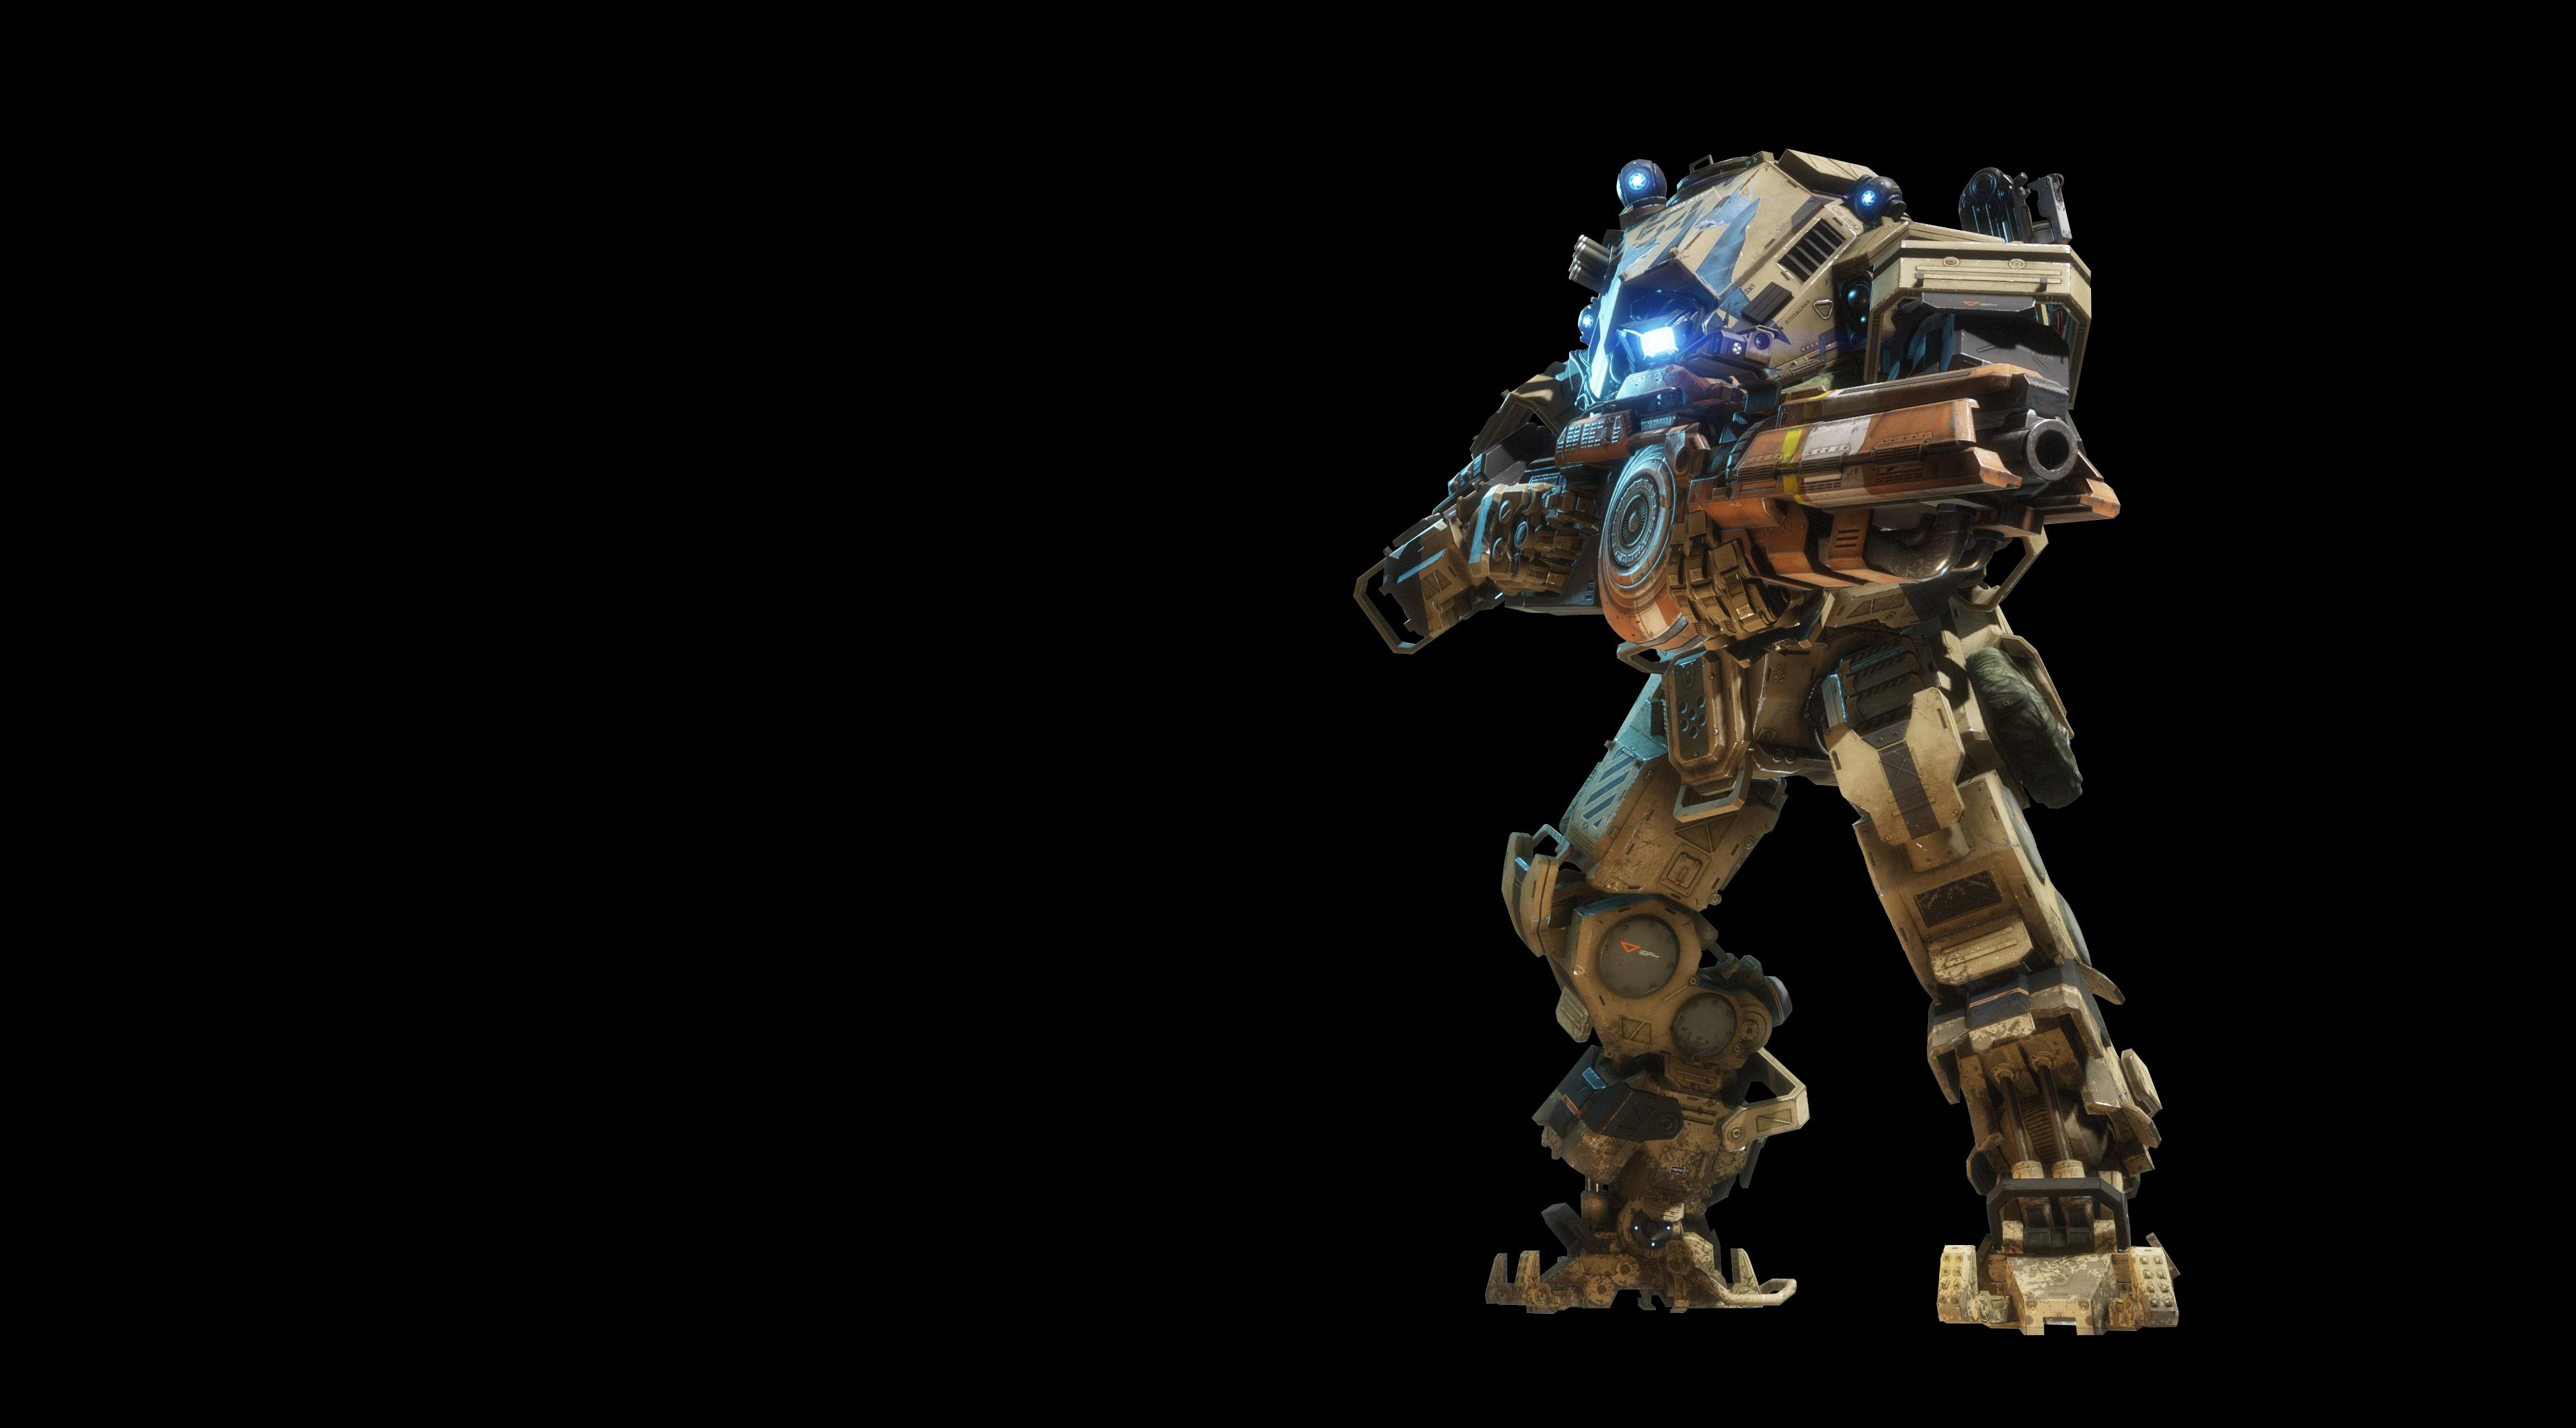 Ион - Titanfall 2 4K, Арт, Титан